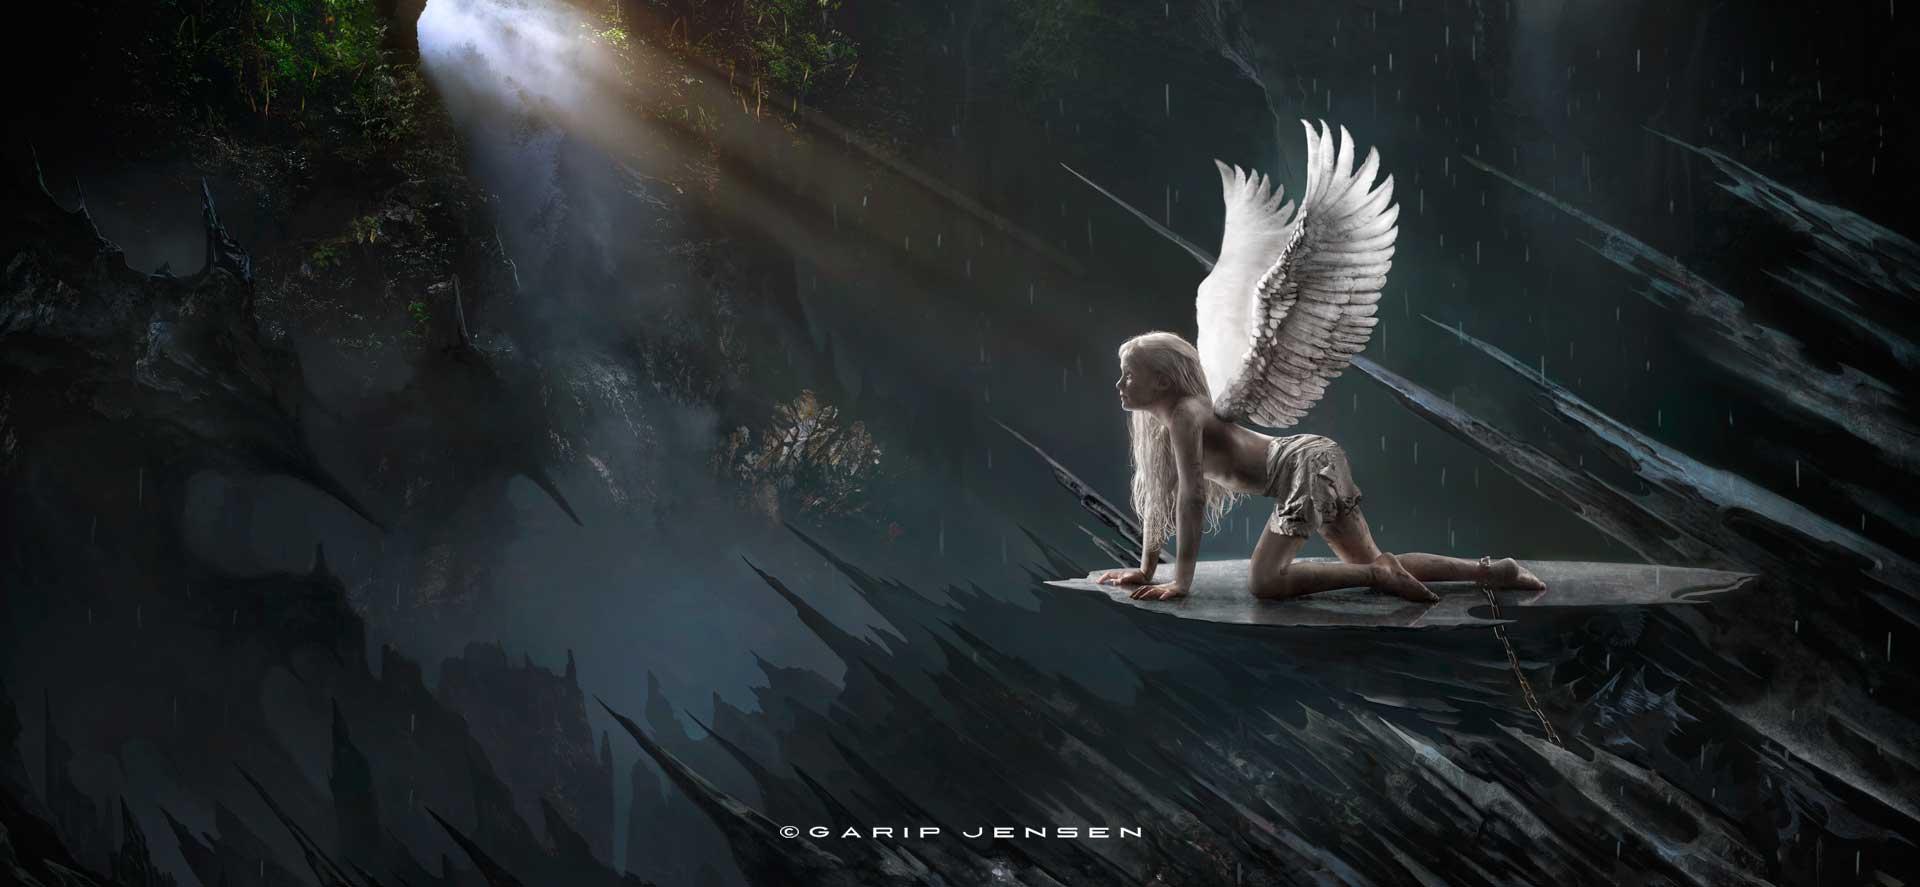 garipjensen-digital-medium-free-your-angel